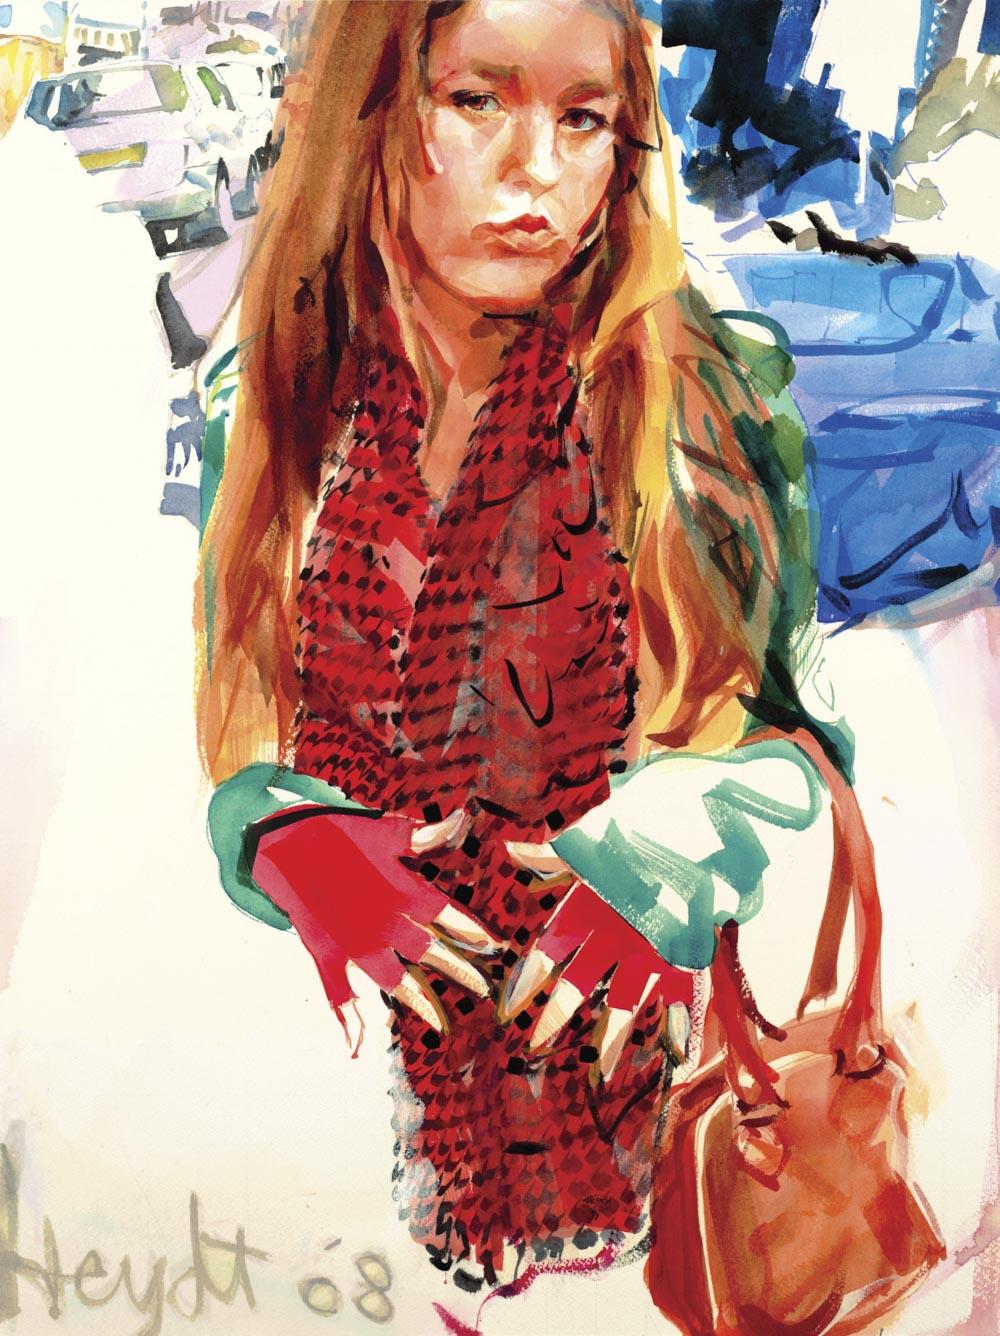 Samantha and her new red gloves, Norde Markt, Amsterdam